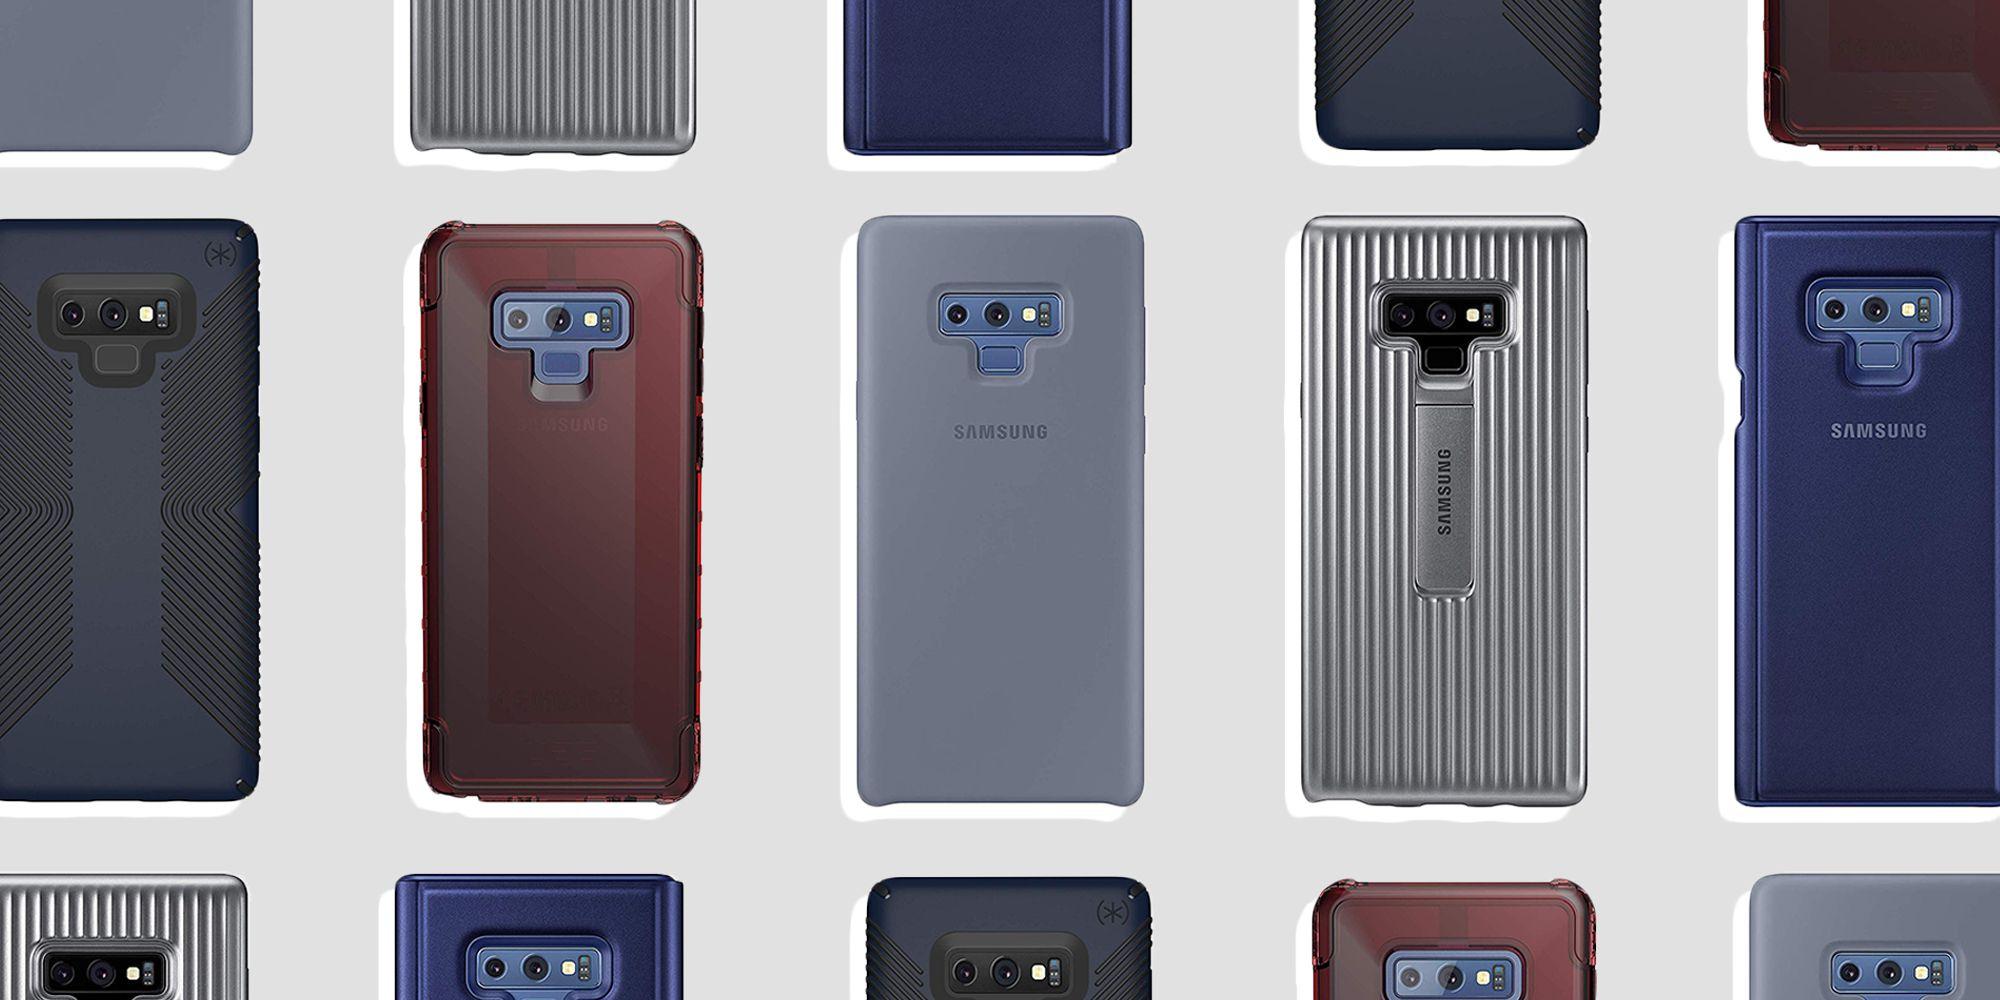 Samsung Galaxy Note9 cases